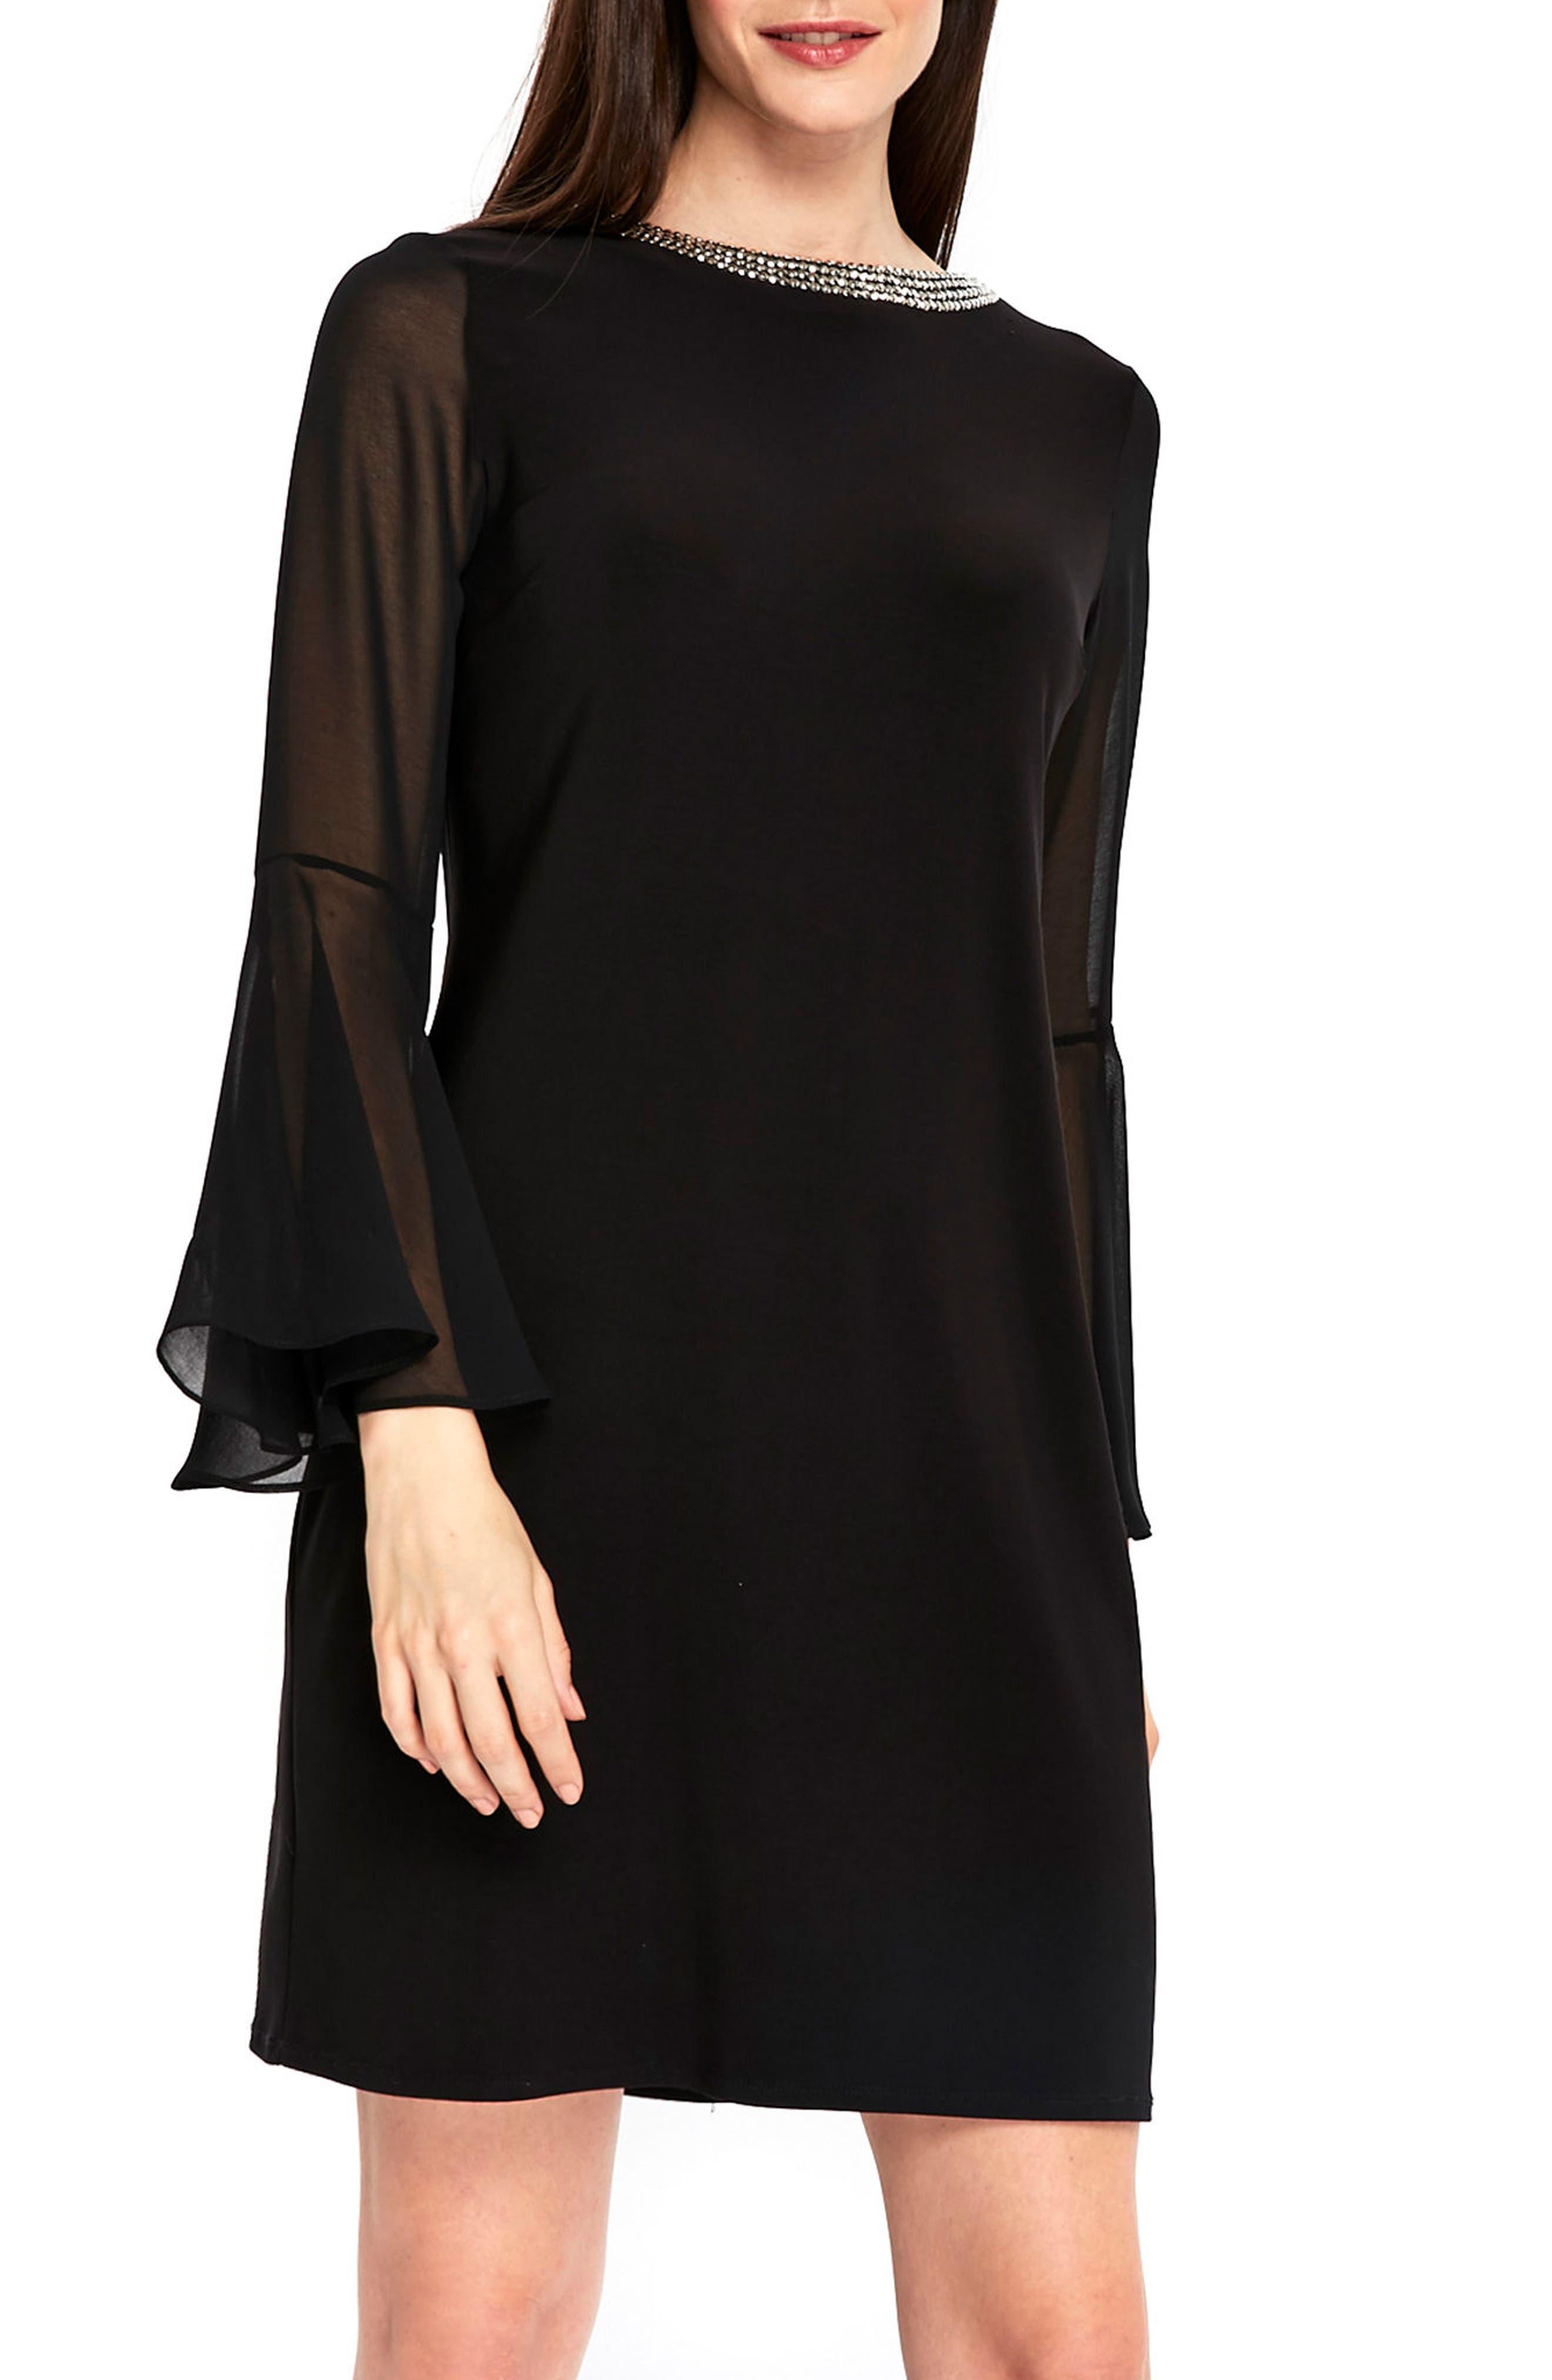 Wallis dress black and white oxford